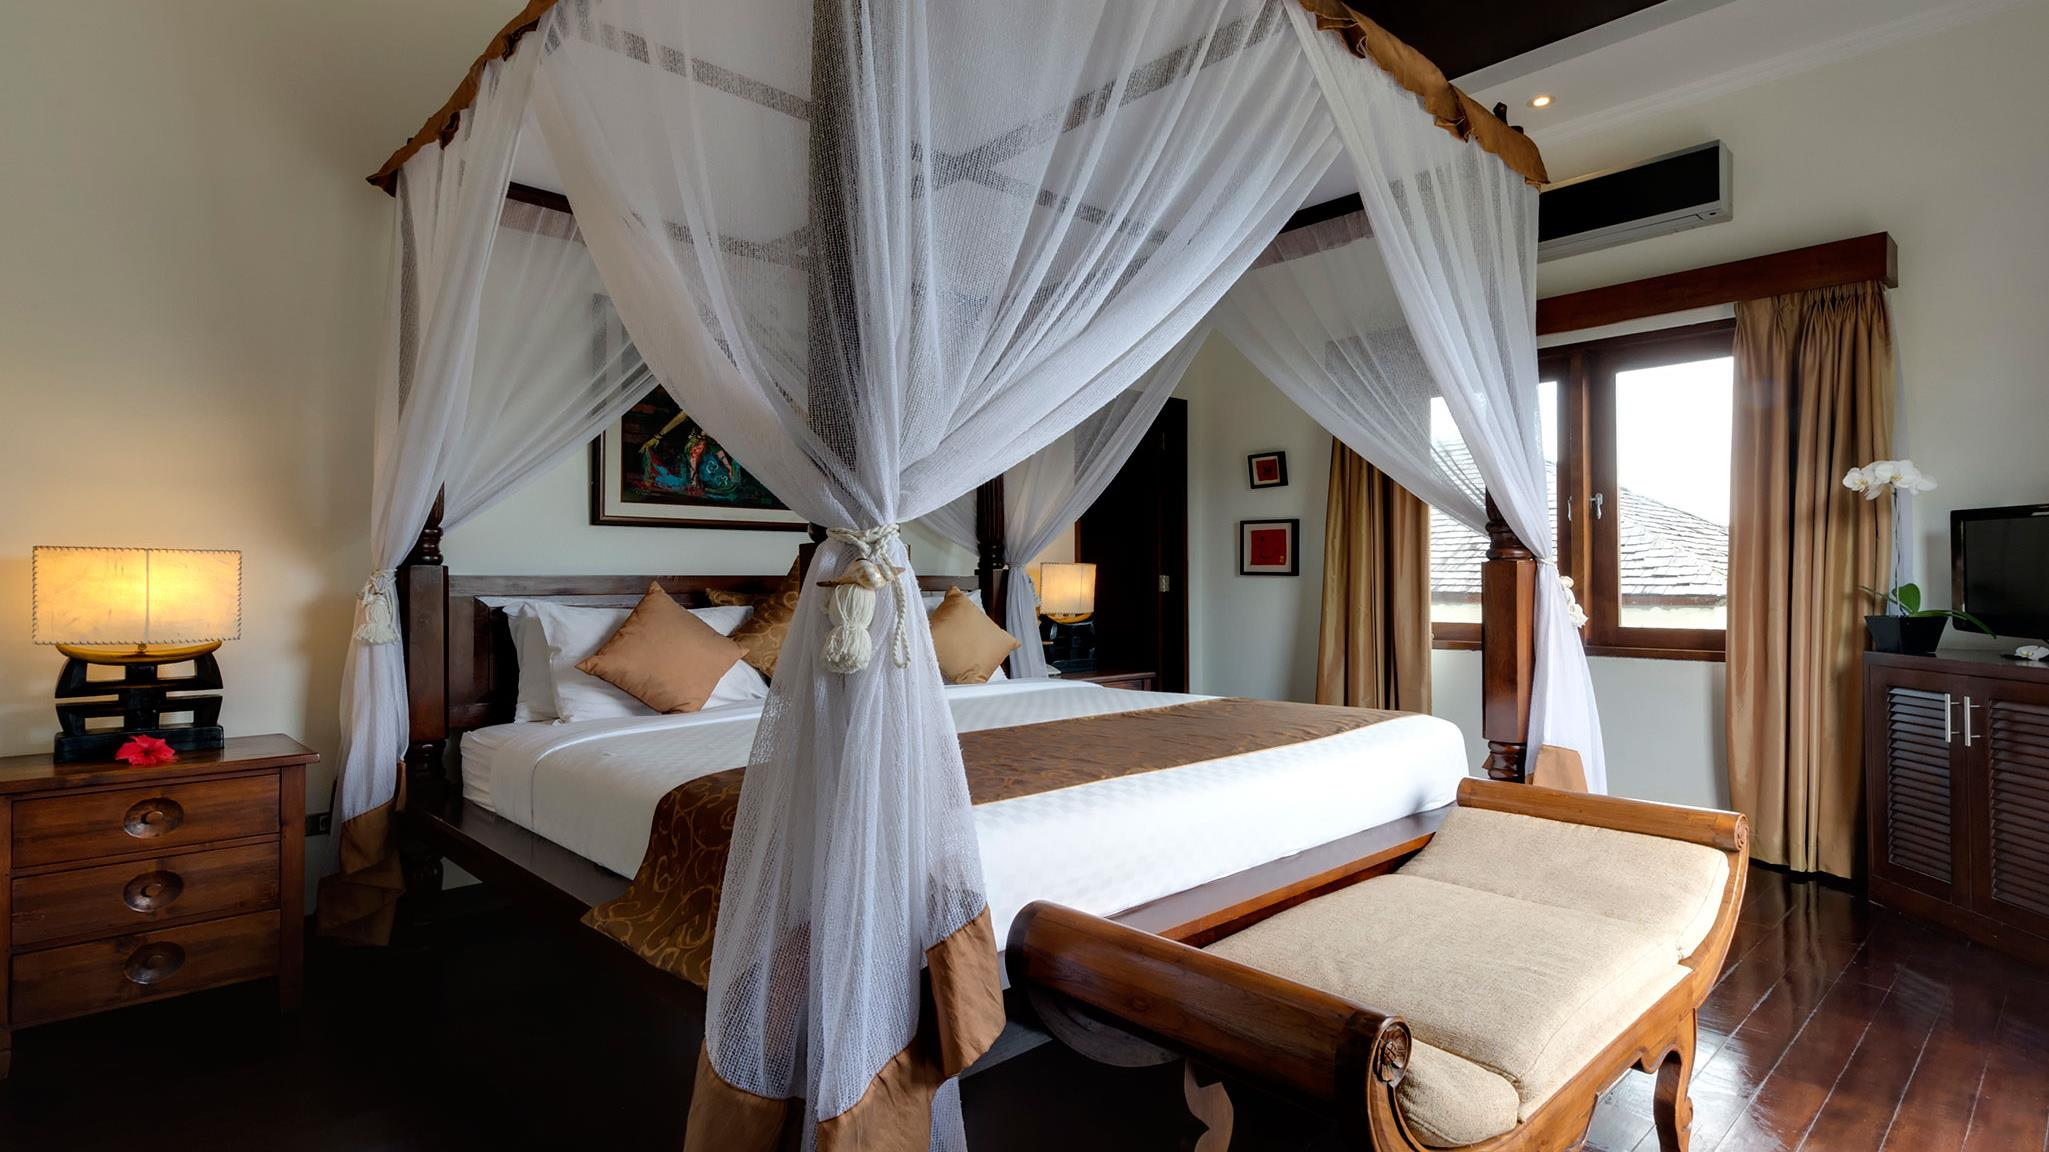 Bedroom with Side Lamps - Villa Kalimaya Three - Seminyak, Bali